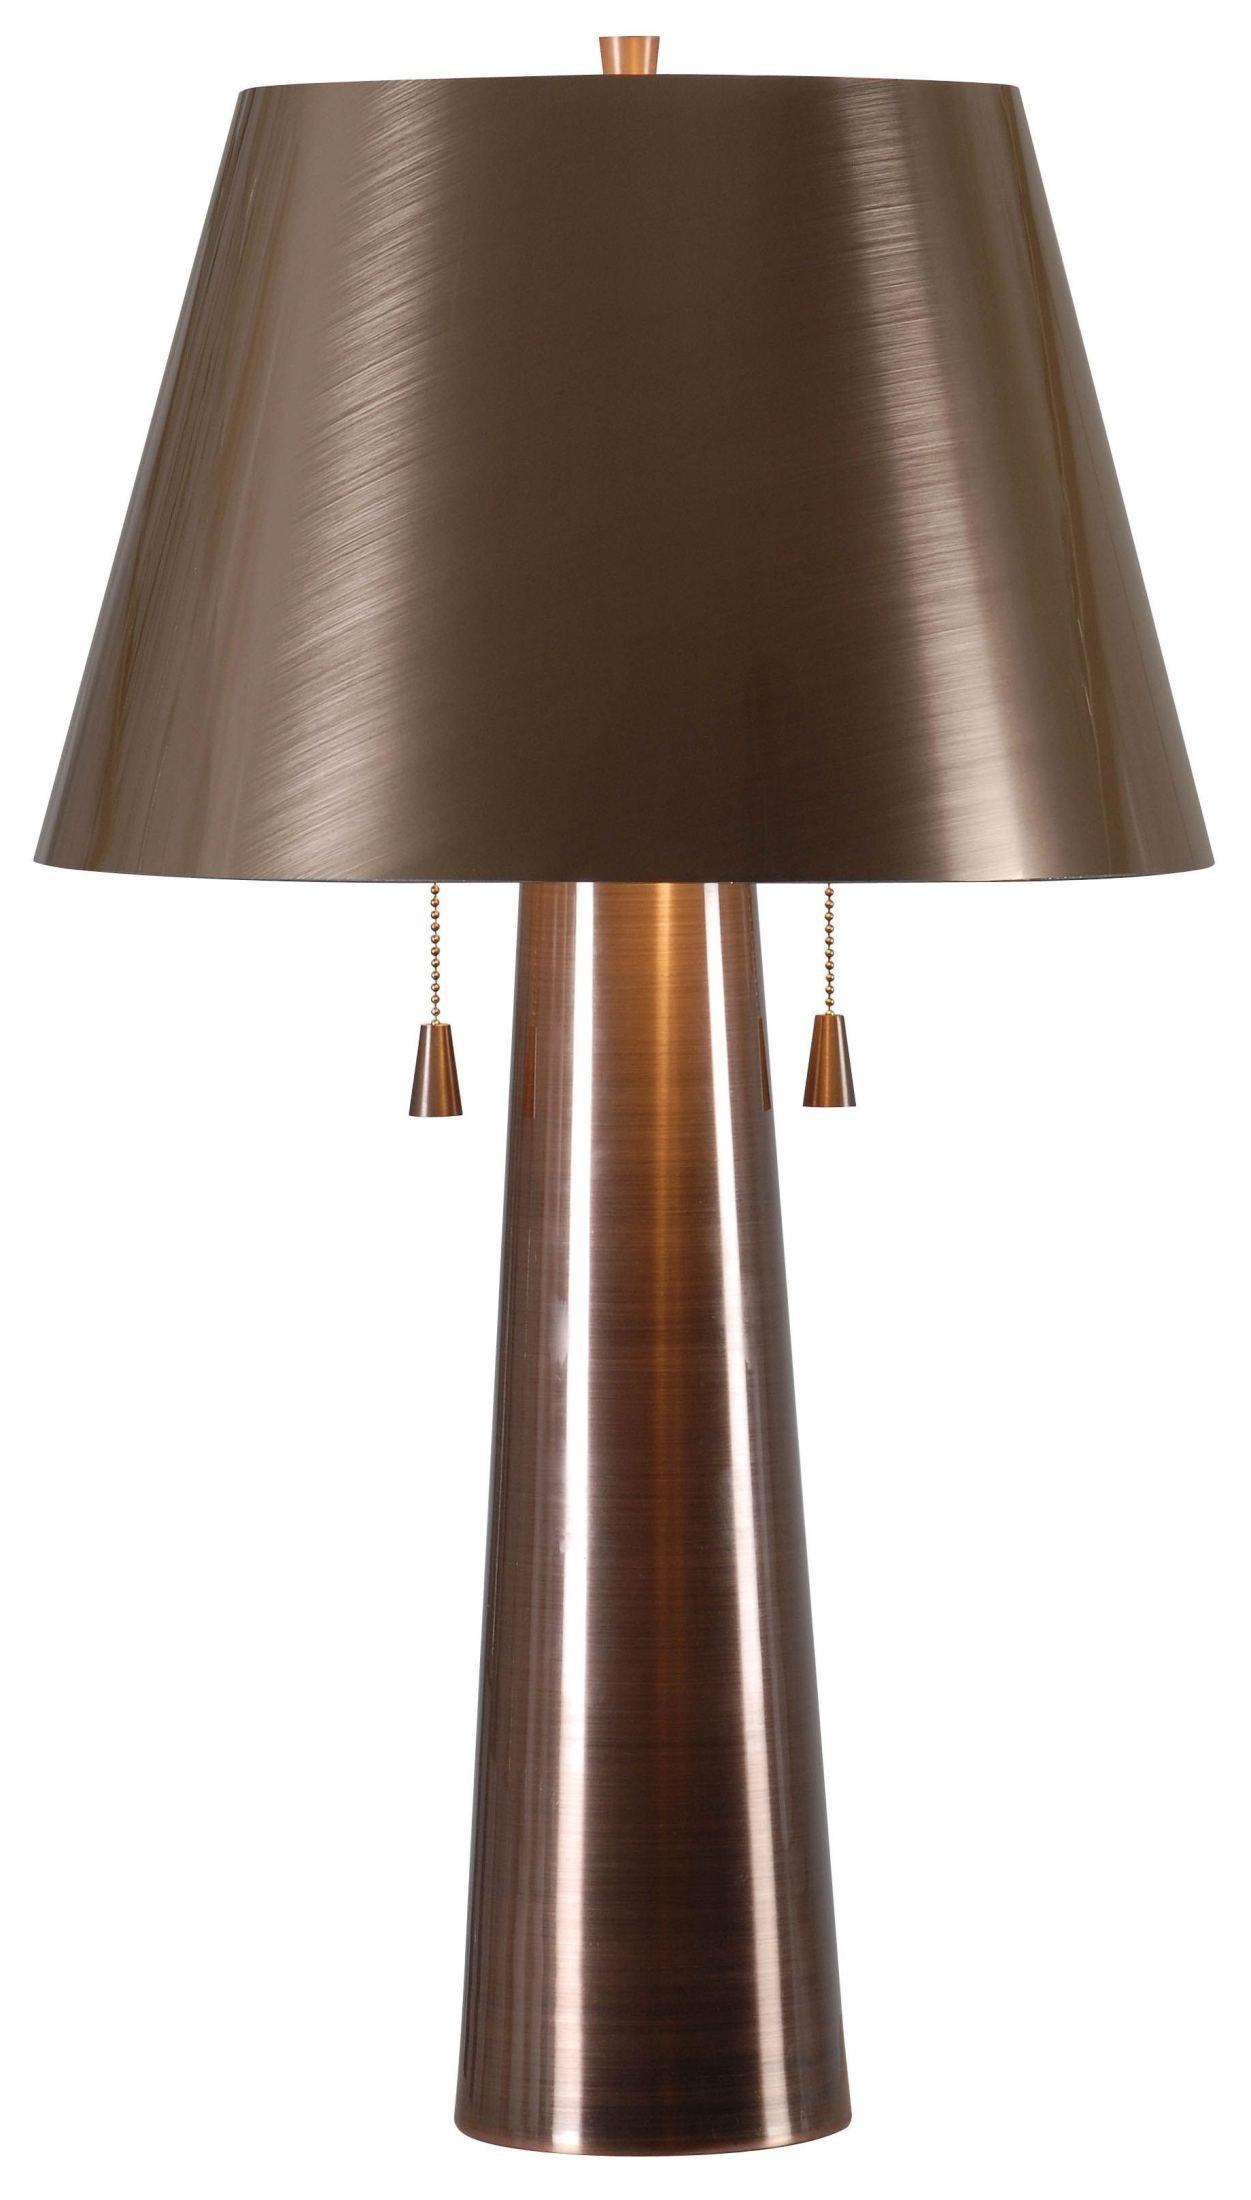 Antique Table Lamps Catalogs : Biblio antique copper table lamp ancp kenroy home